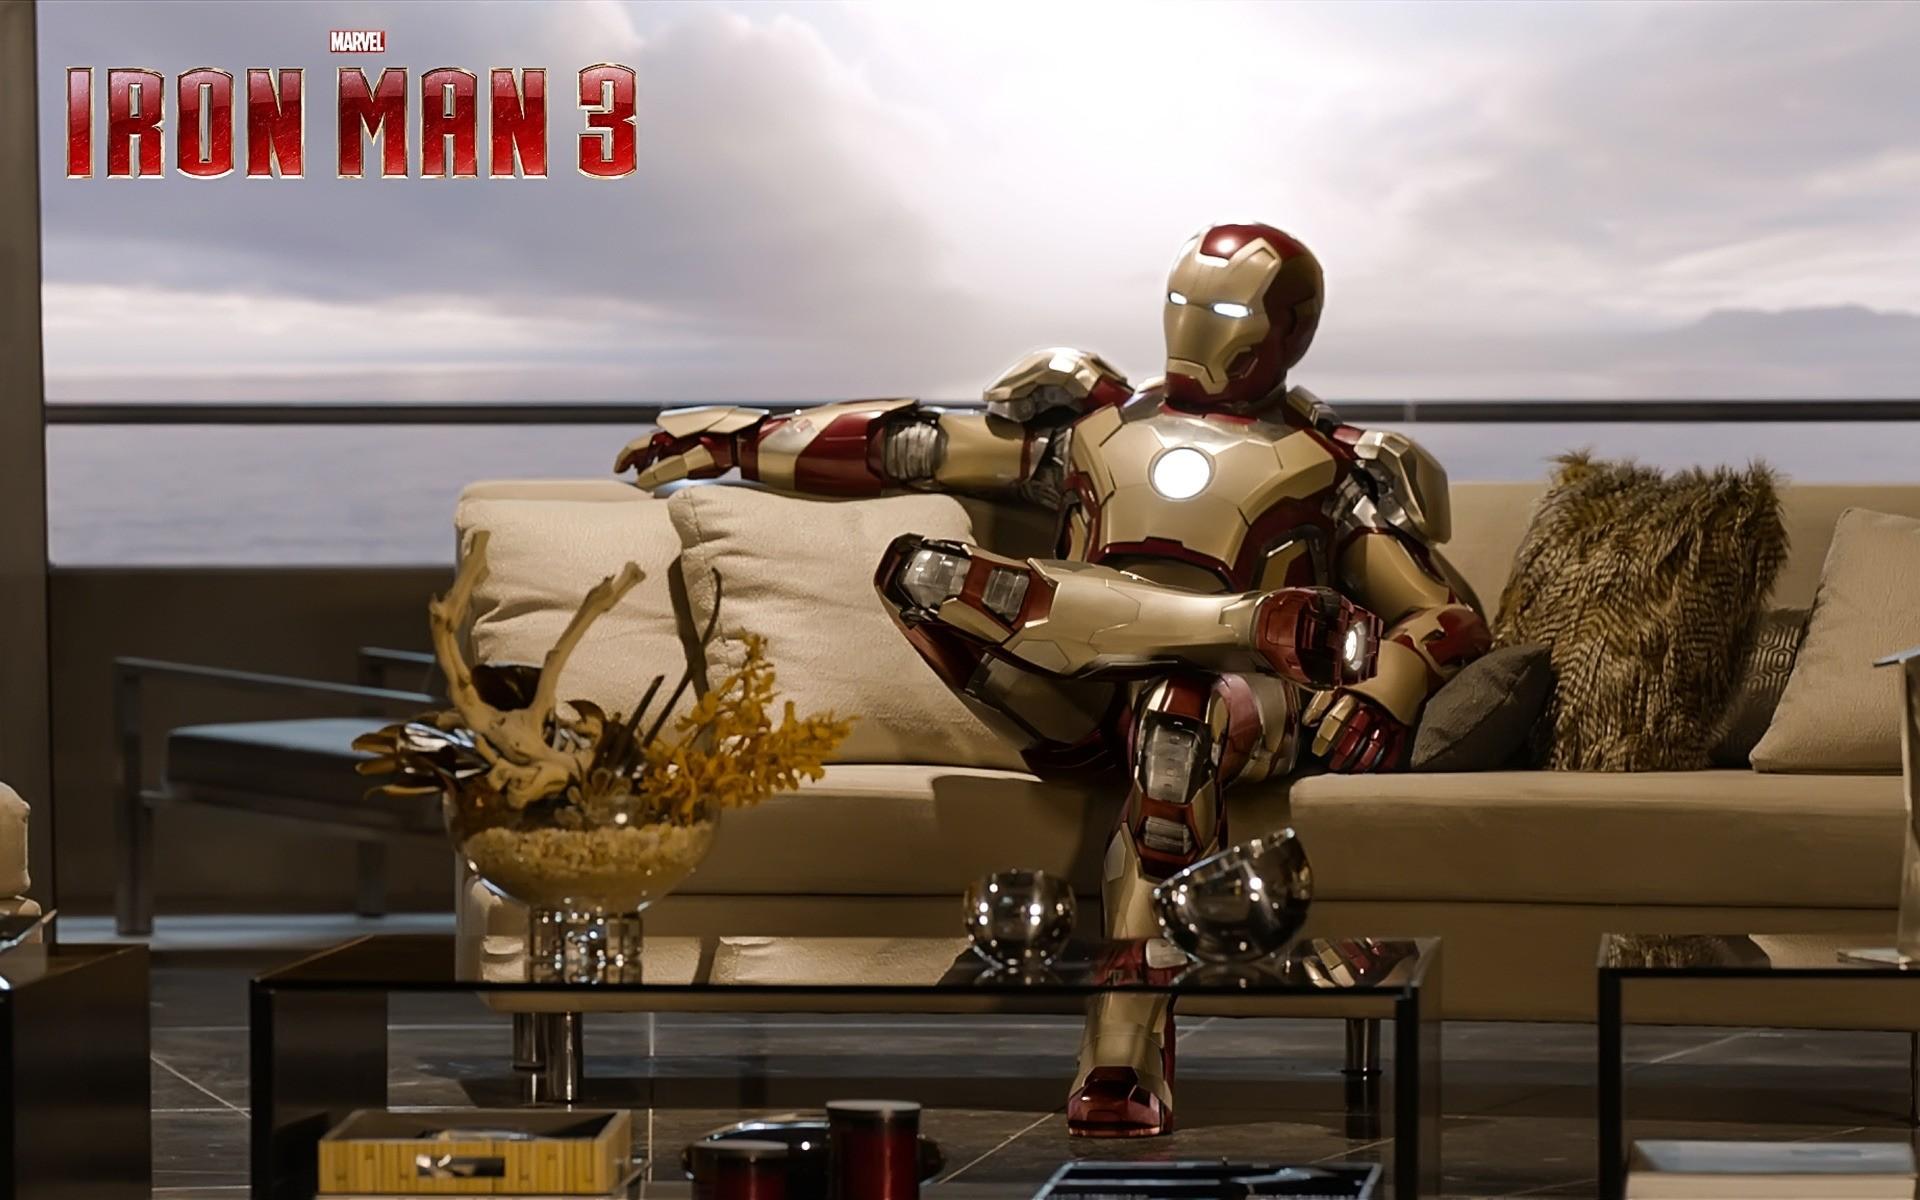 cool iron man 3. desktop wallpapers for free.